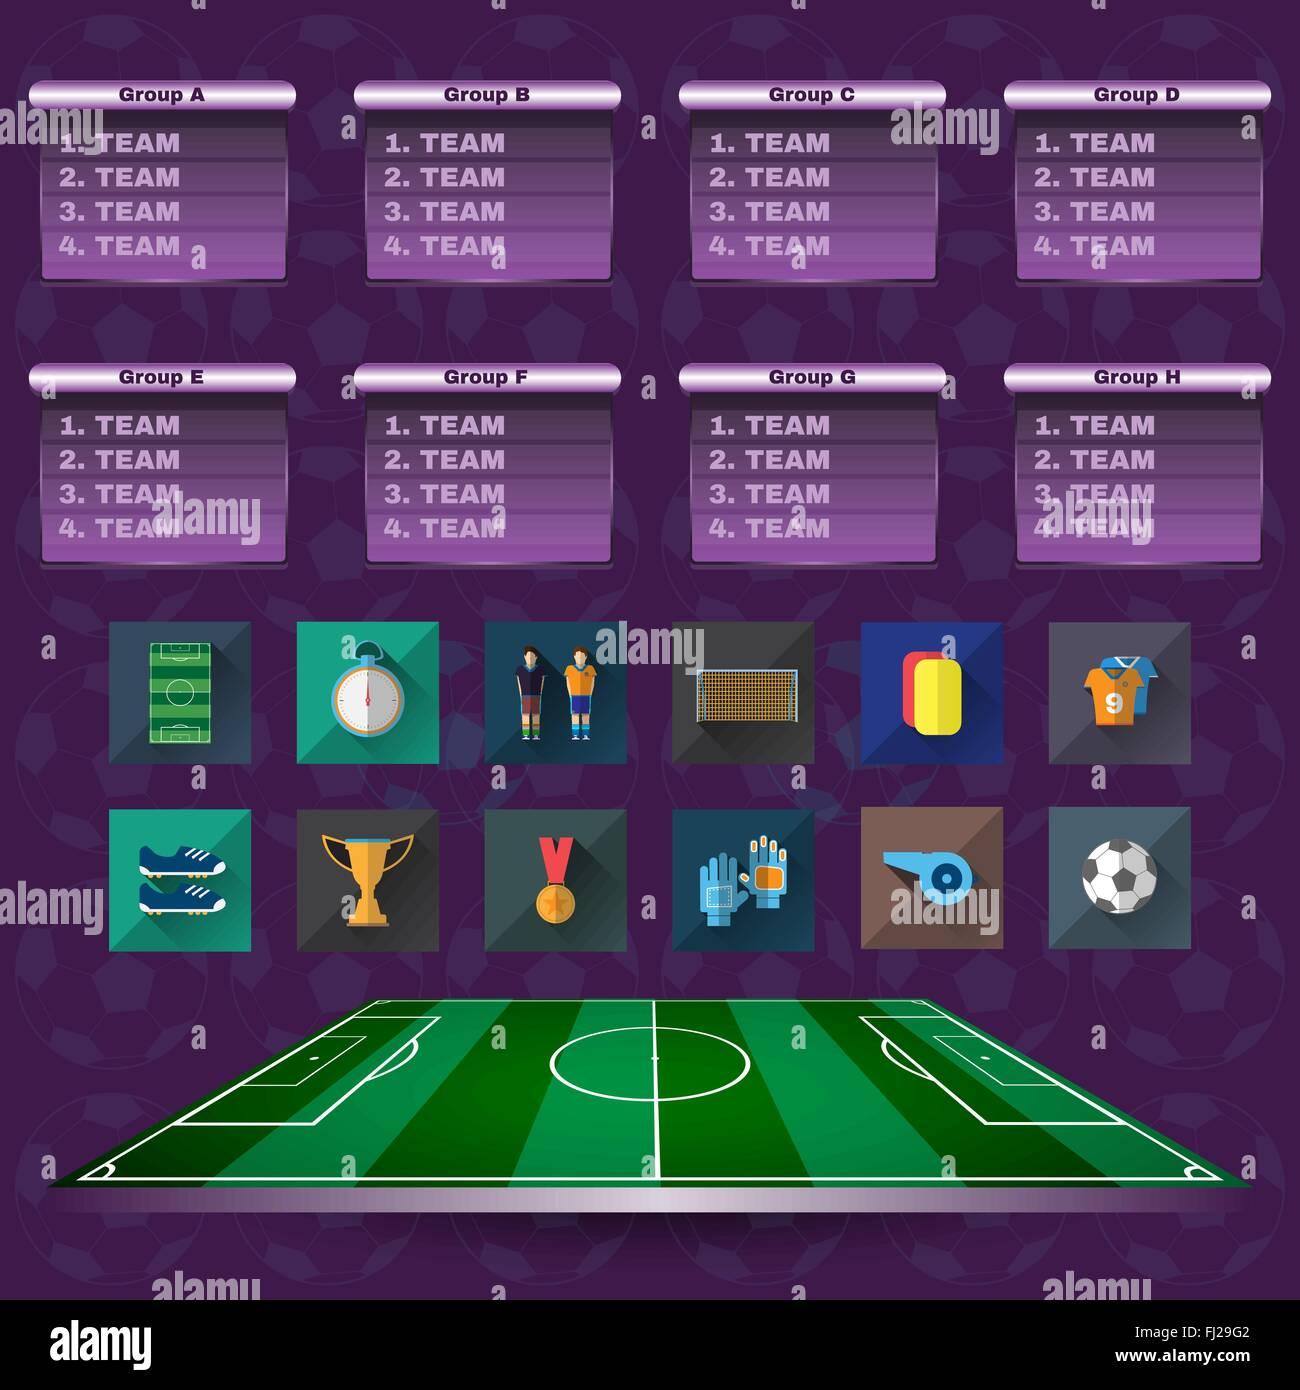 Soccer Scoreboard Champions Illustration  Soccer Match Table Stock